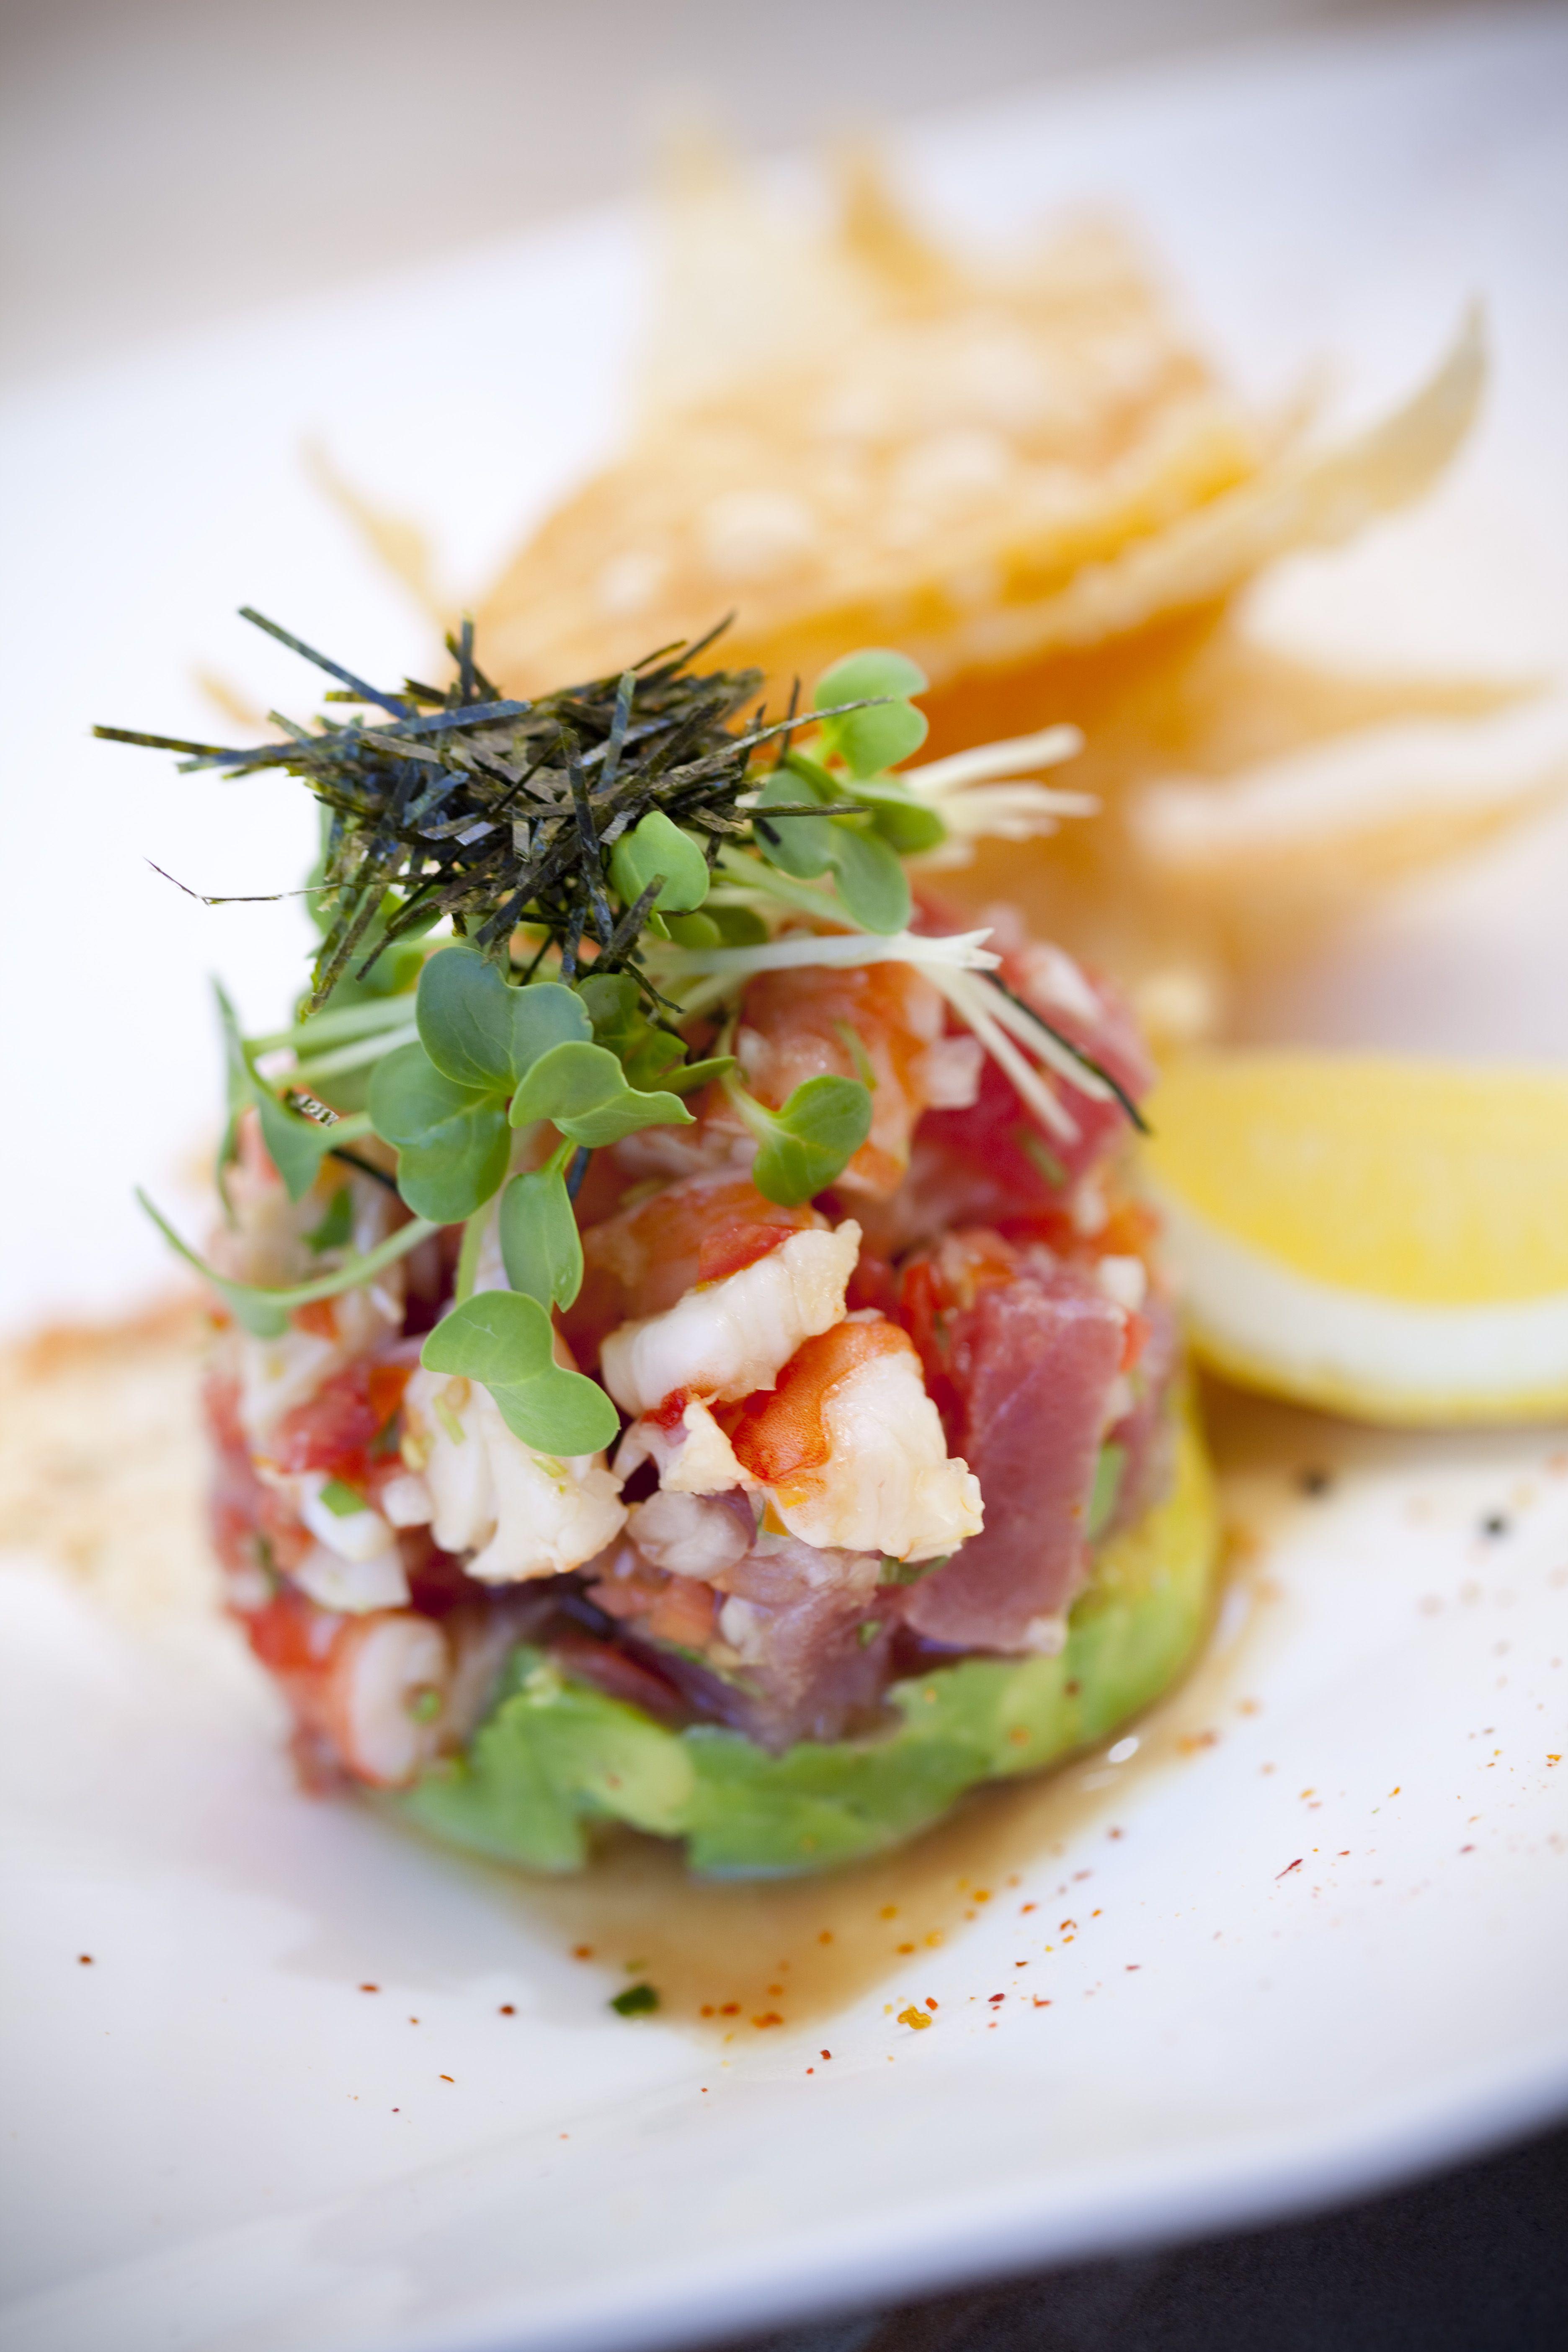 yuzu ceviche yellowfin tuna tiger prawns and avocado